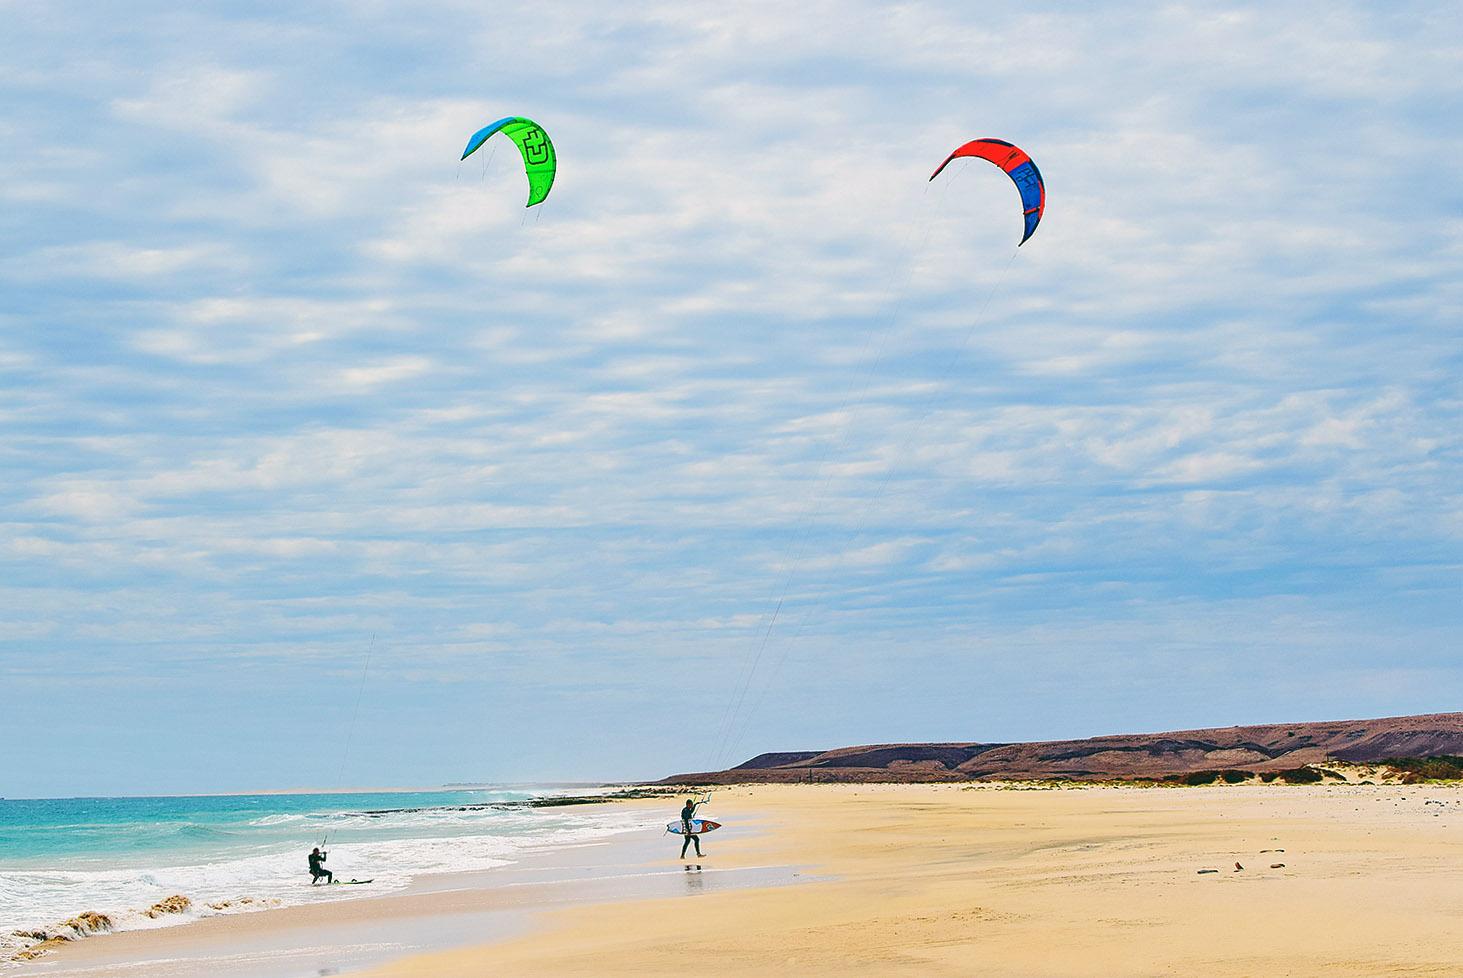 Kitesurfing Trips and excursions -  Morabeza Kitesurfing in Boa Vista Cape Verde (1).jpg